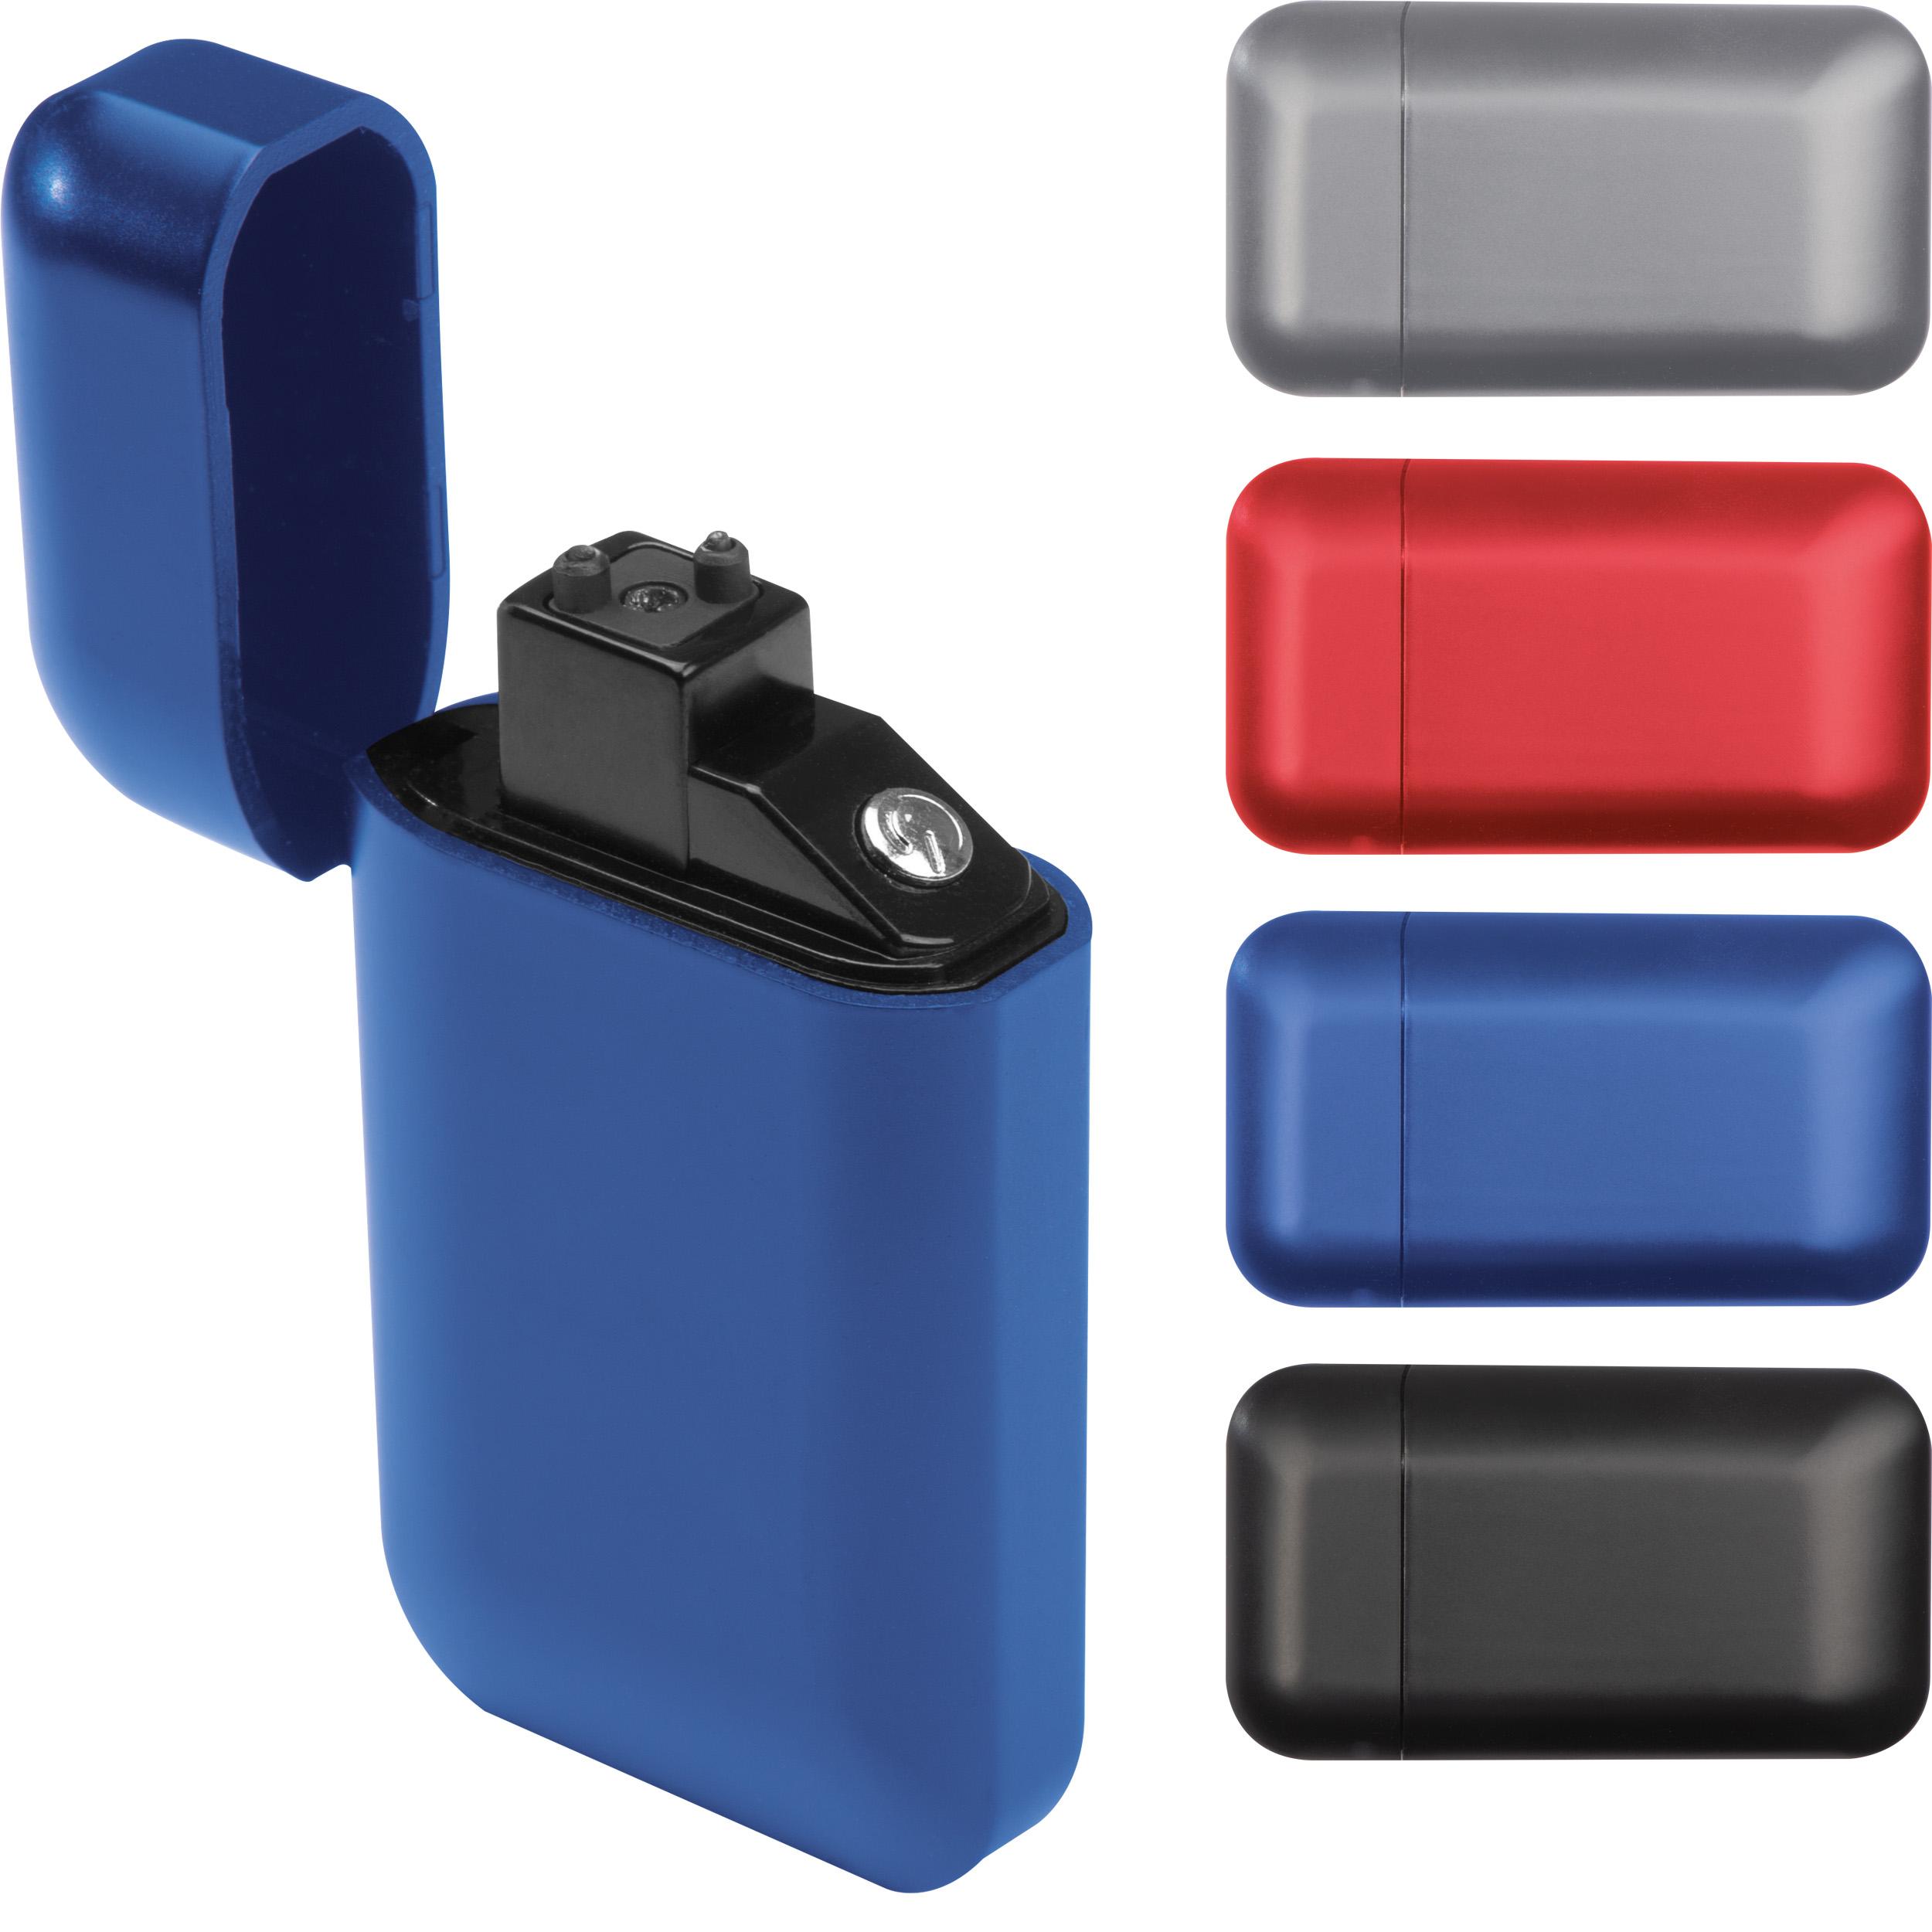 Mattes USB-Feuerzeug